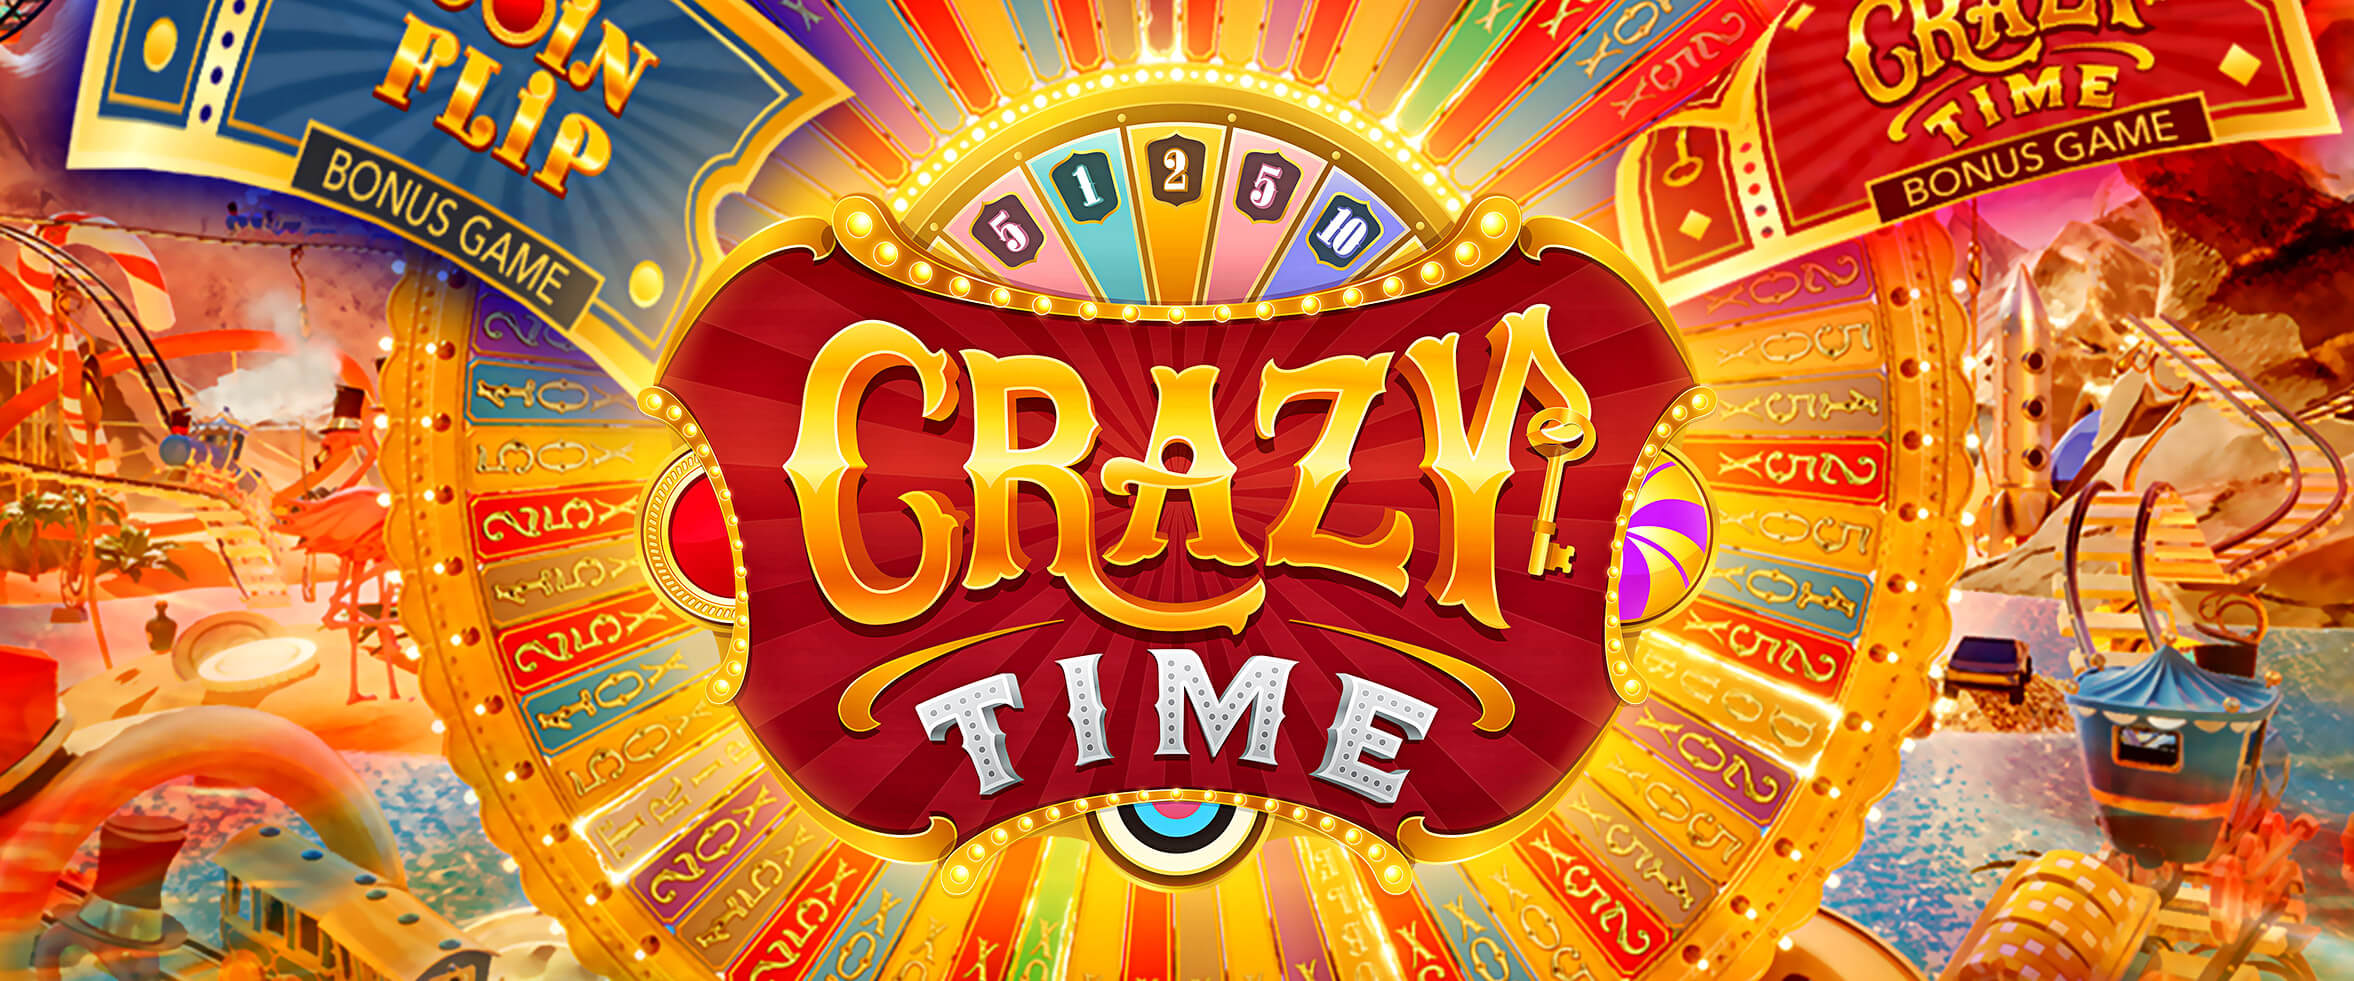 Palkintoja Crazy Time -peliin